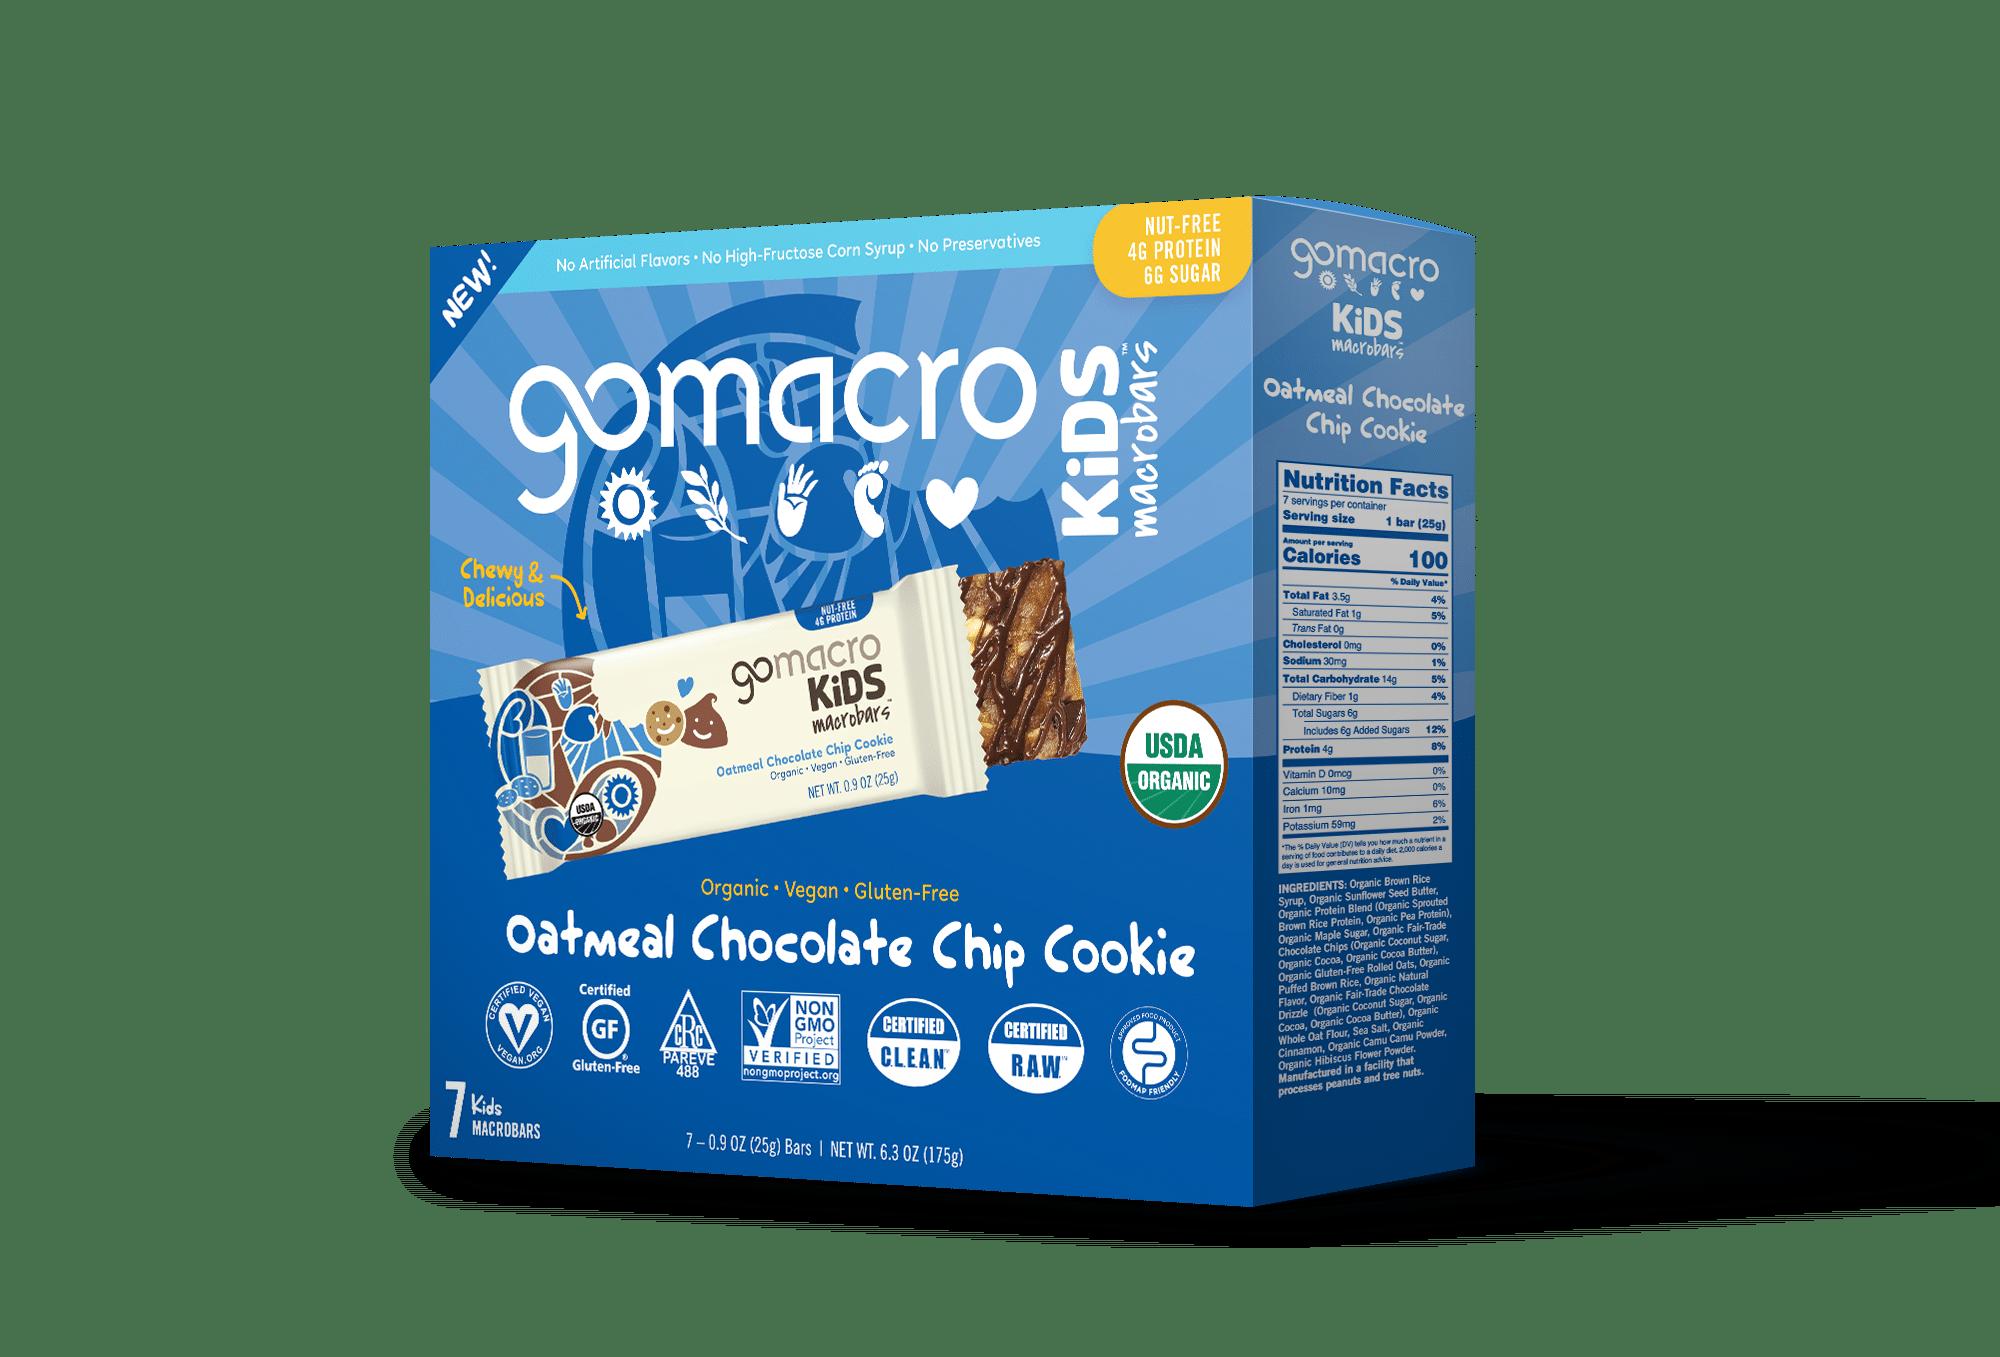 GoMacro Launches New Kids MacroBar Line